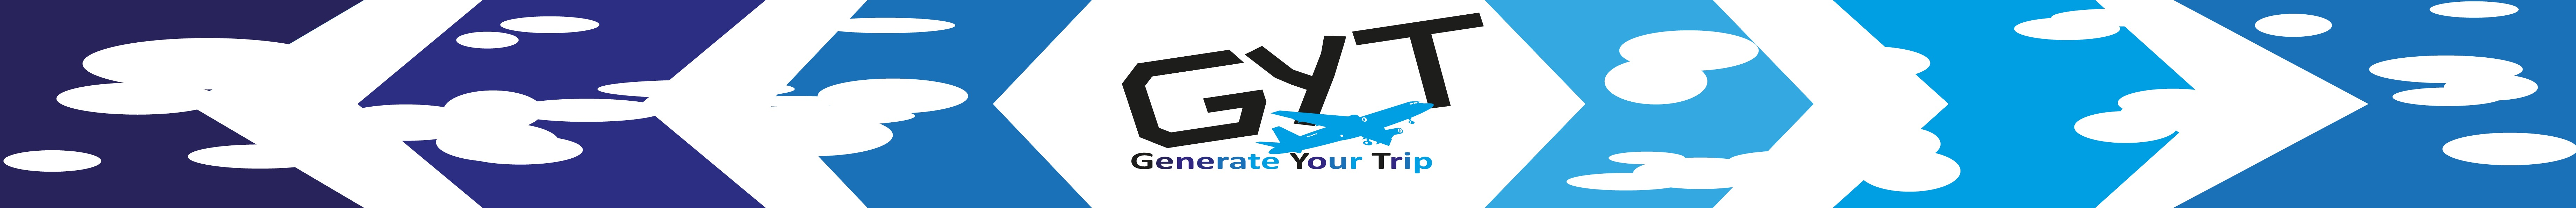 GYT banner.ai